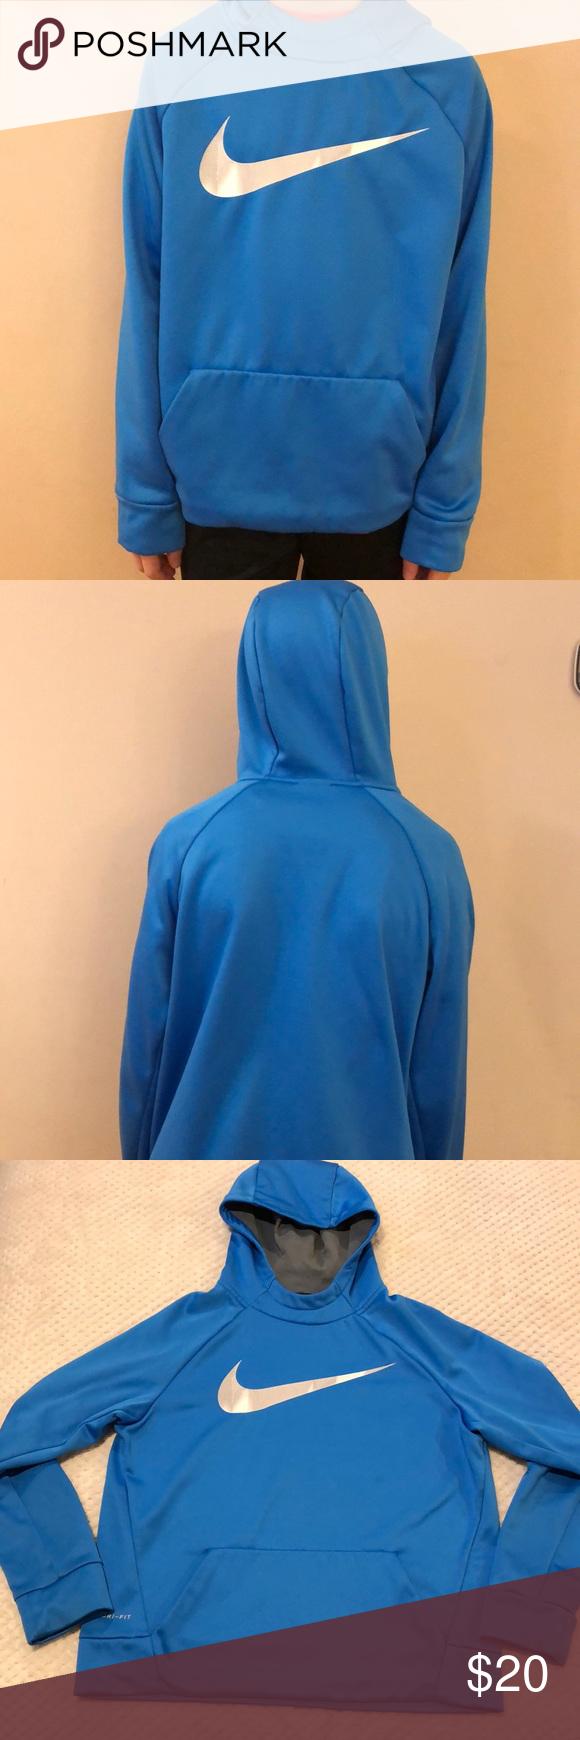 Nike Dri Fit Hooded Sweatshirt Hooded Sweatshirts Sweatshirts Nike Dri Fit [ 1740 x 580 Pixel ]